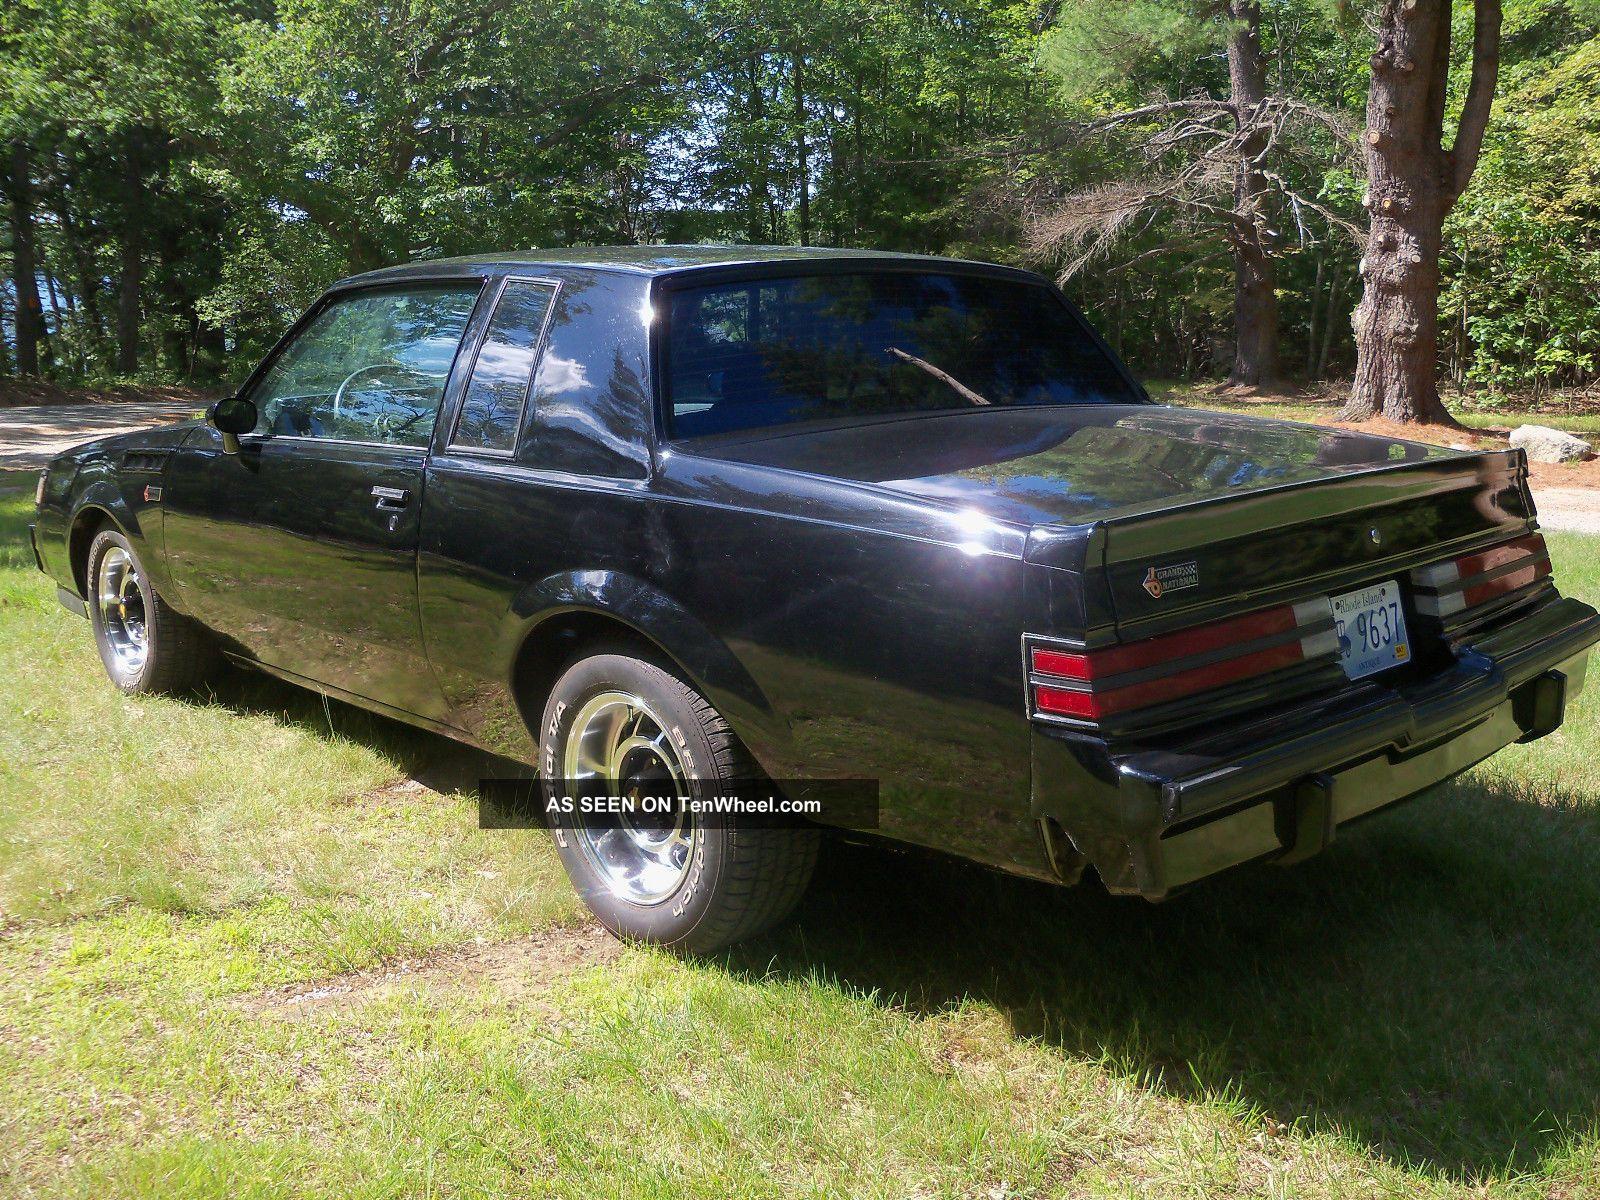 1987 buick grand national 3 8 turbo interior wheels posi - 1987 buick grand national interior ...